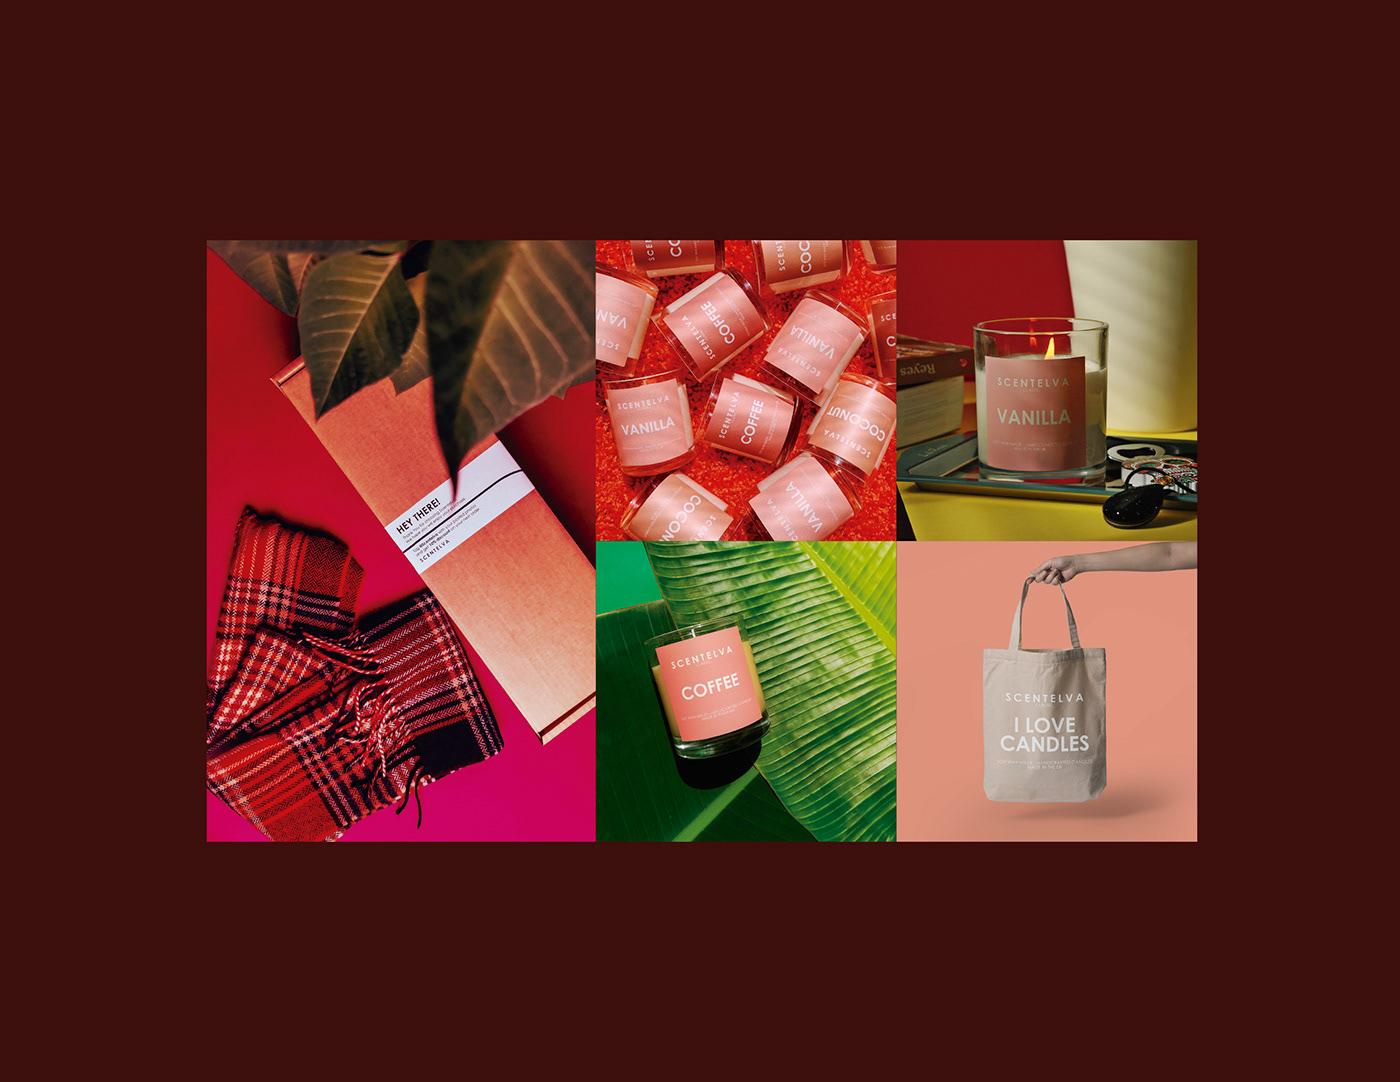 aromas candle Coconut Coffee england Packaging scents UK vanilla velas